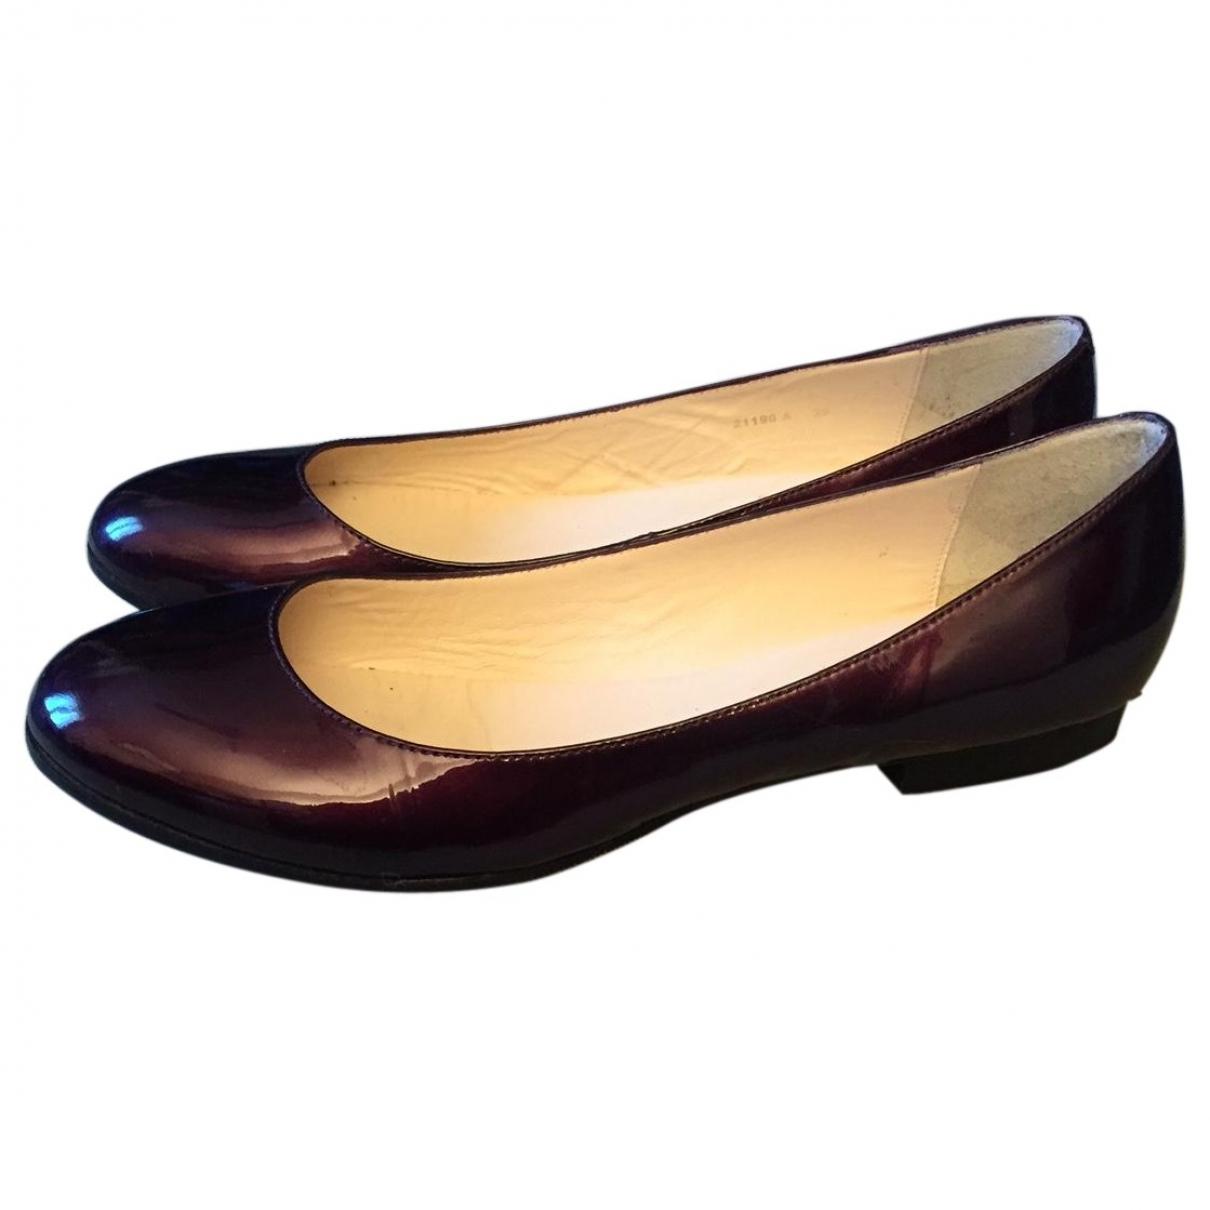 Lk Bennett \N Purple Patent leather Ballet flats for Women 39 EU